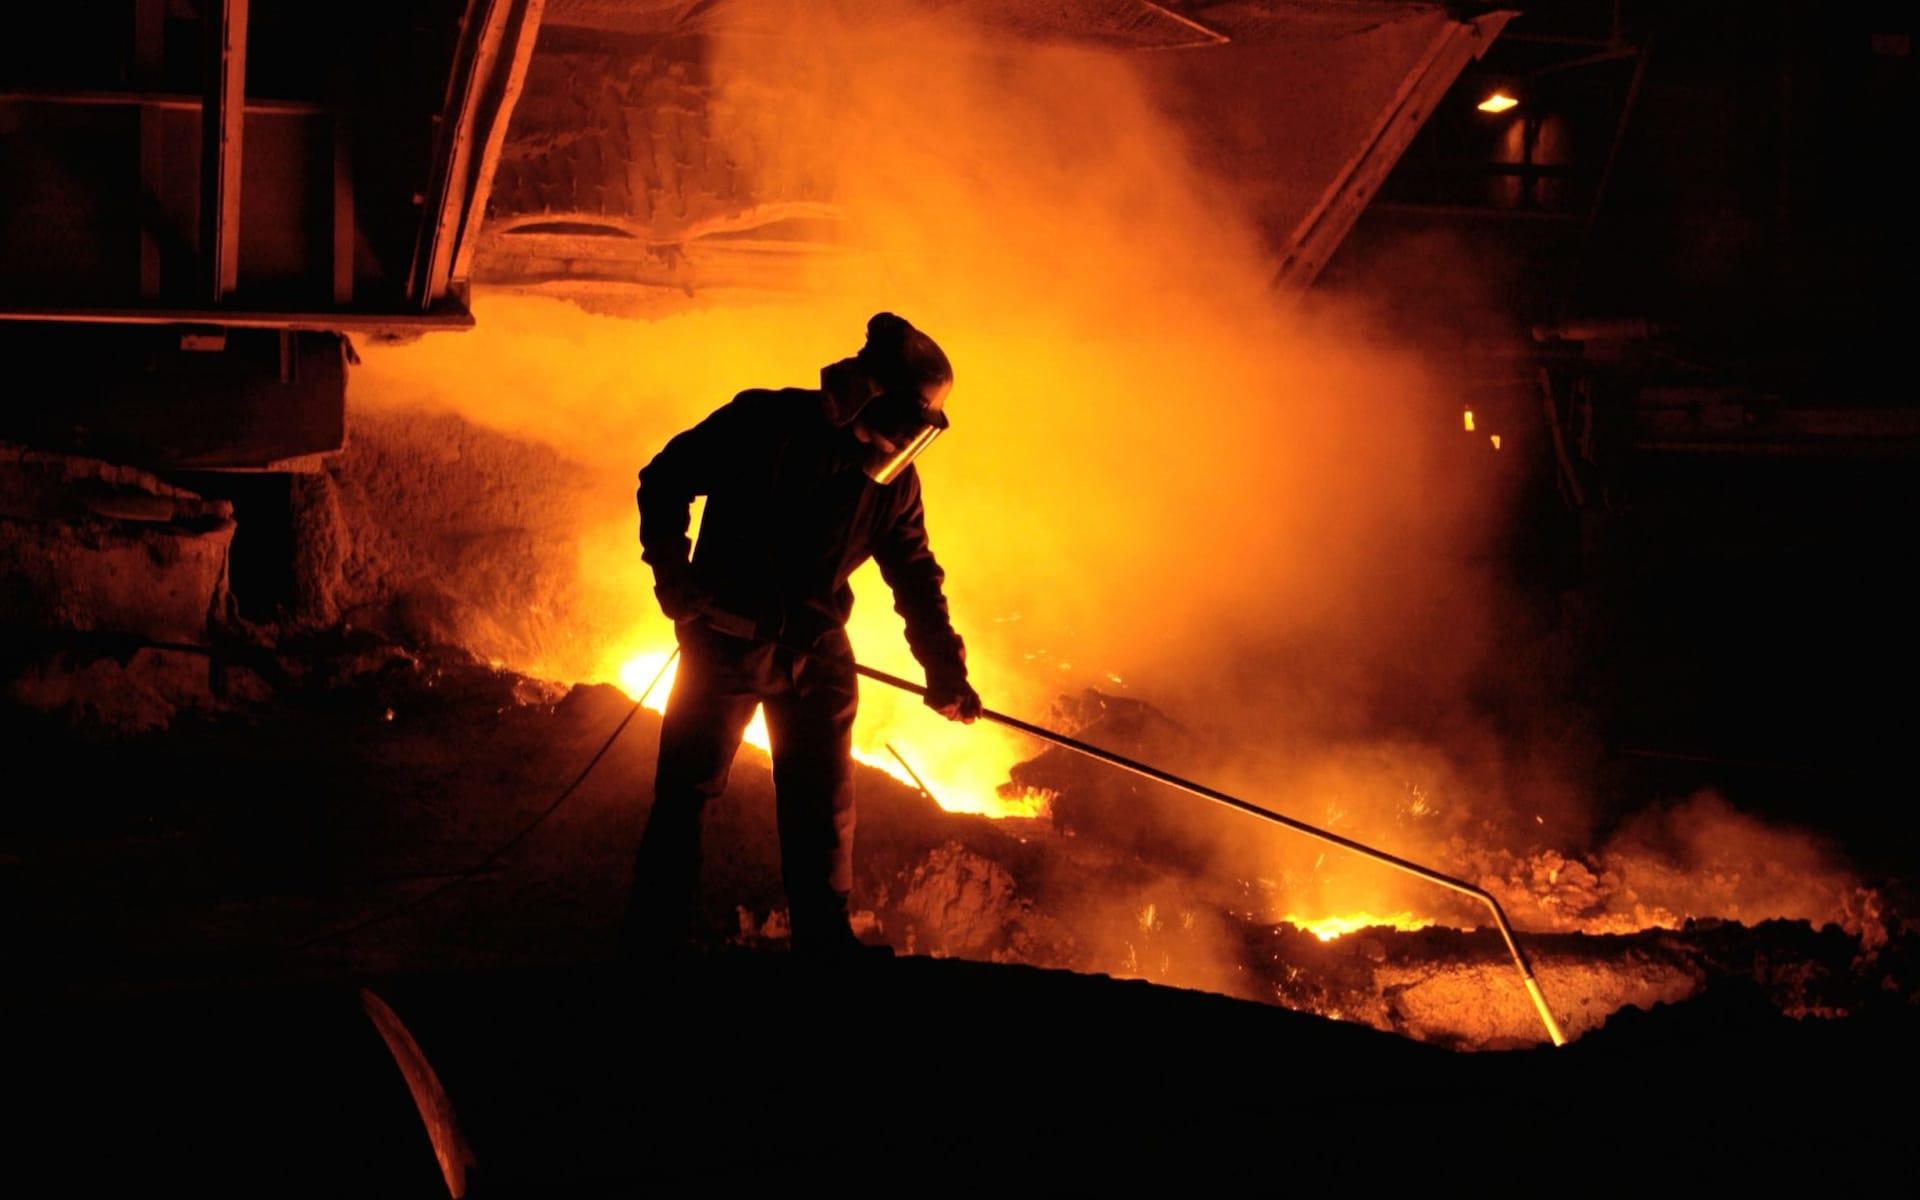 tata-steel-uk-thyssenkrupp-ubs-steel-news-uk-steel-sector-uk_67954